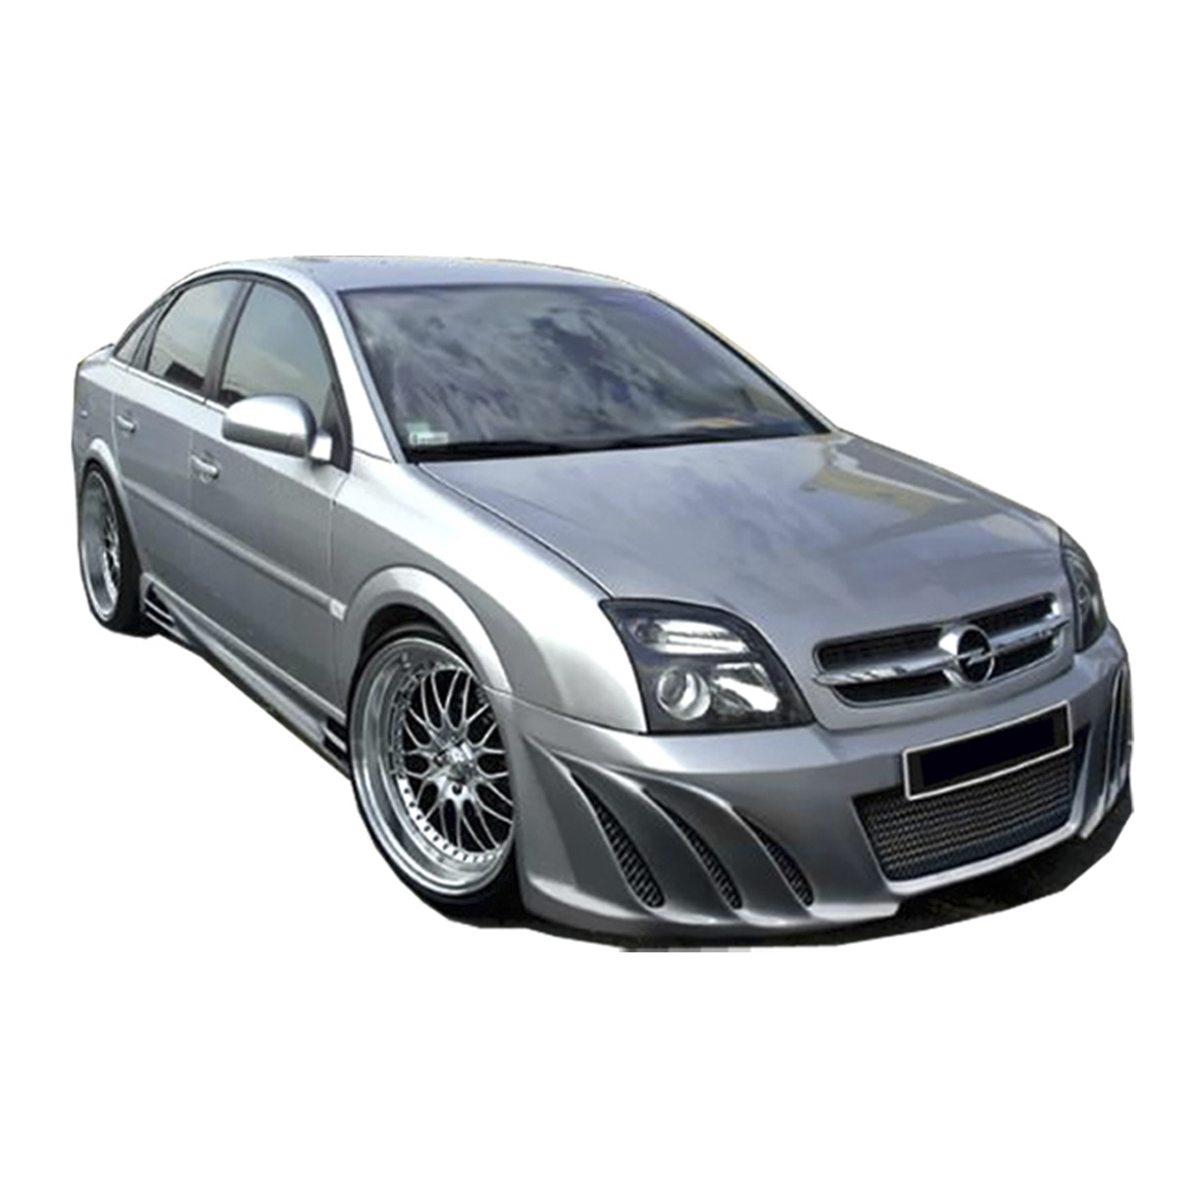 Opel-Vectra-C-Shark-Frt-PCM028